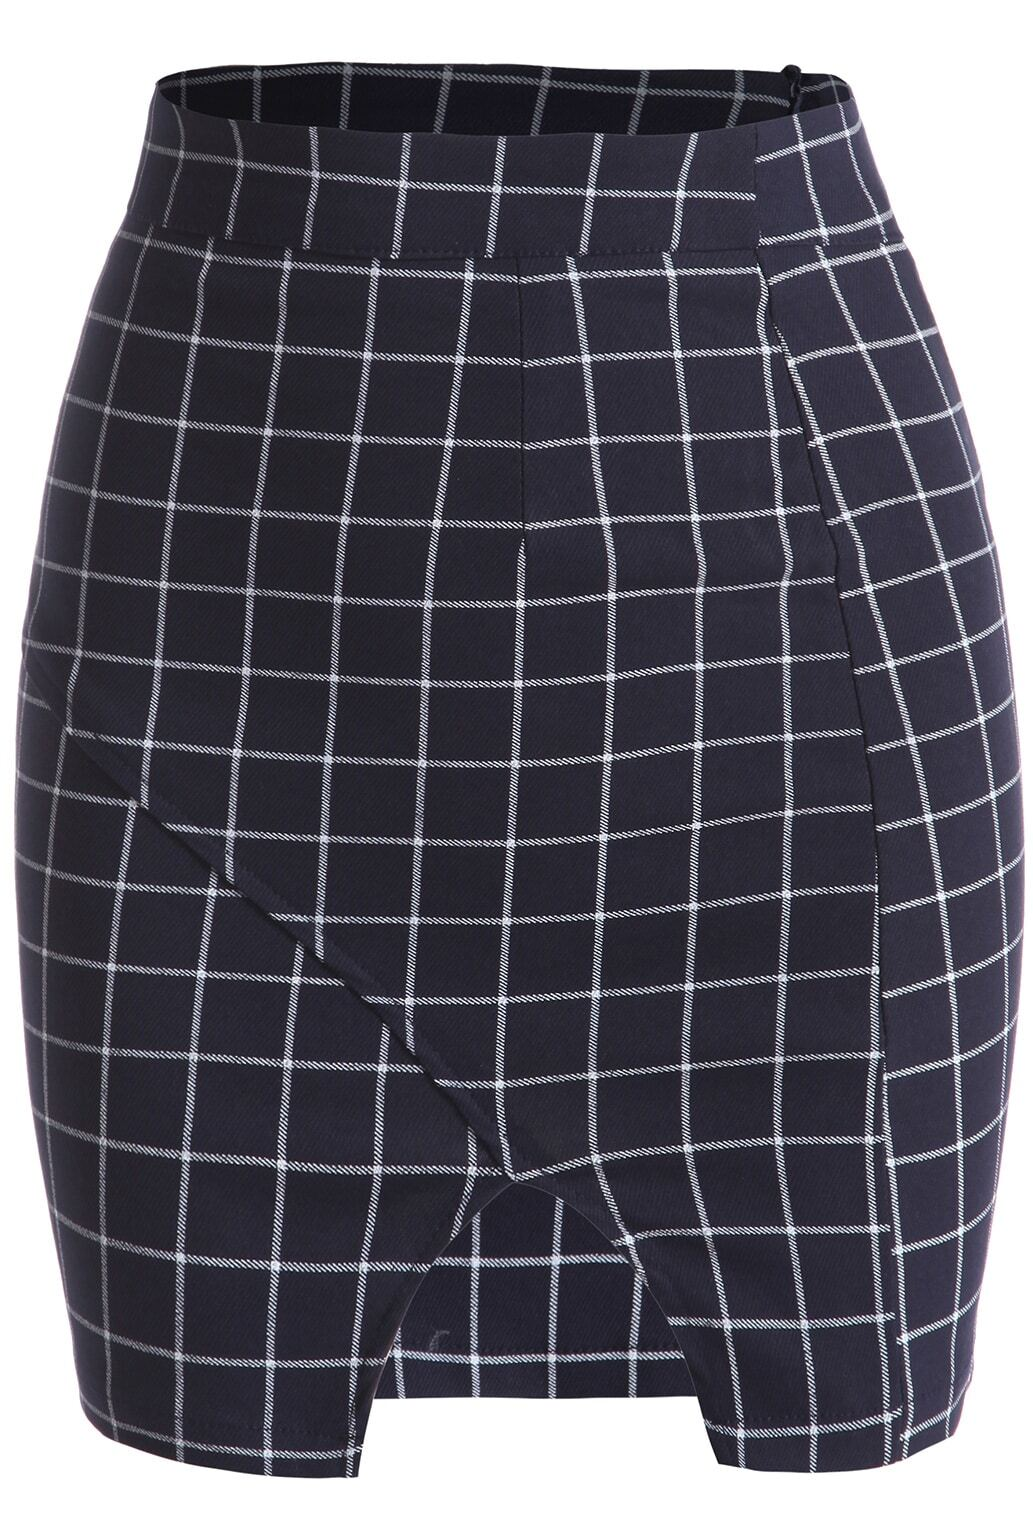 royal blue plaid bodycon skirt shein sheinside